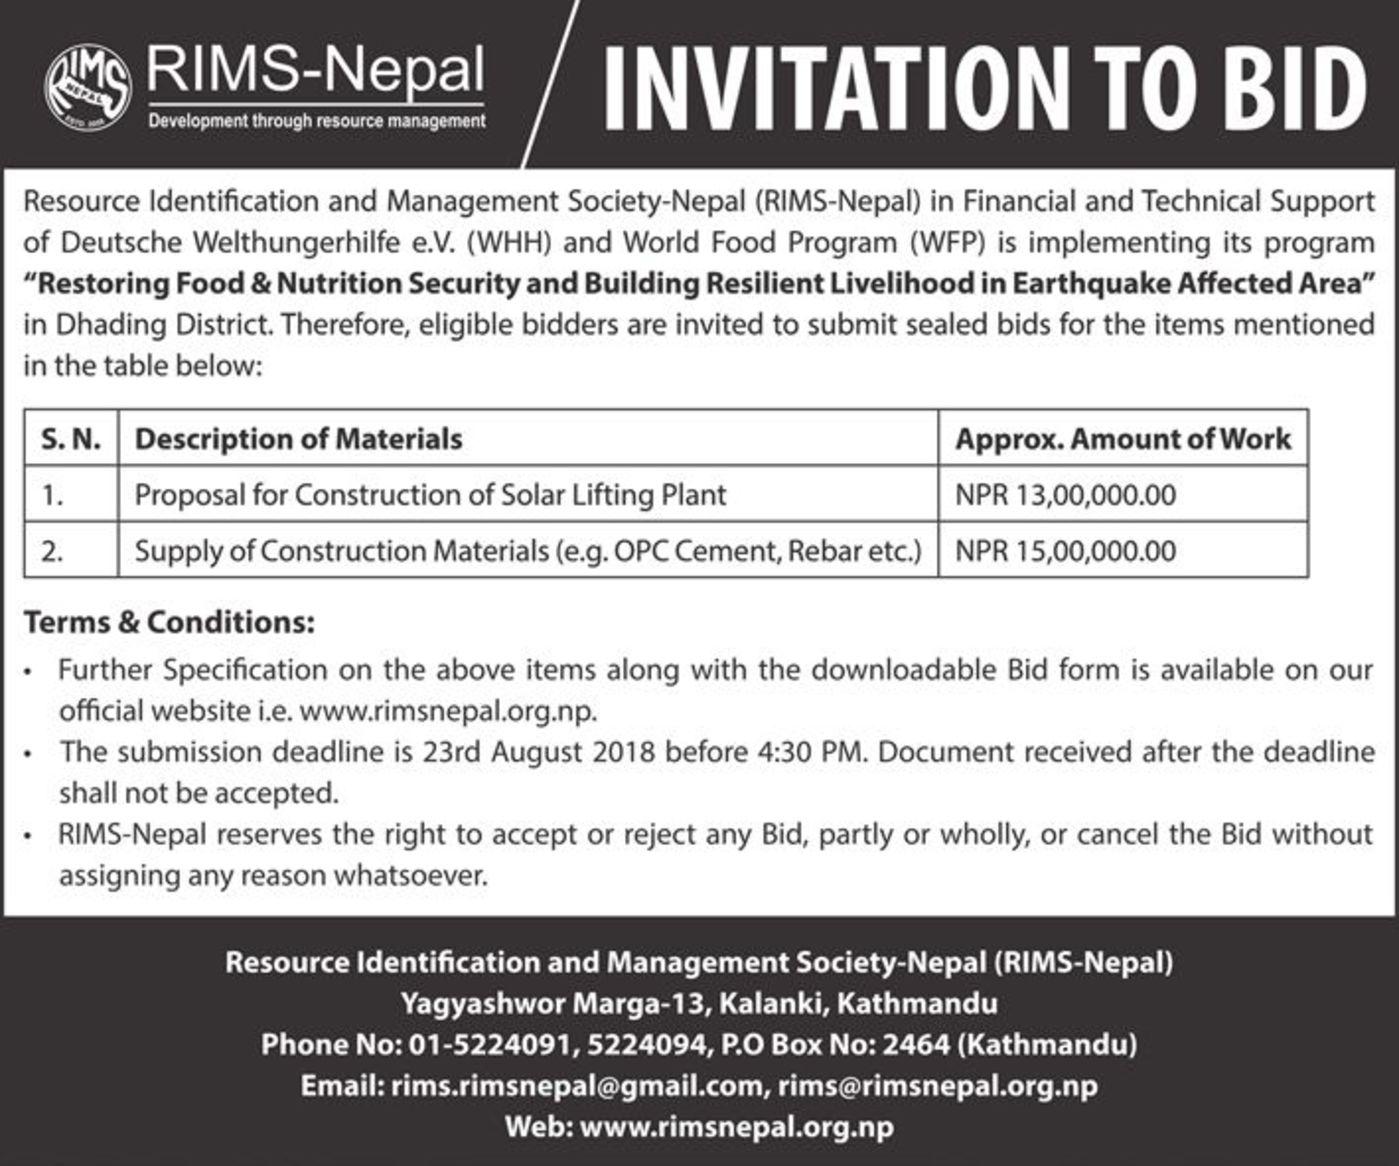 Bid Proposal   Invitation For Bid Proposal For Construction Of Solar Lifting